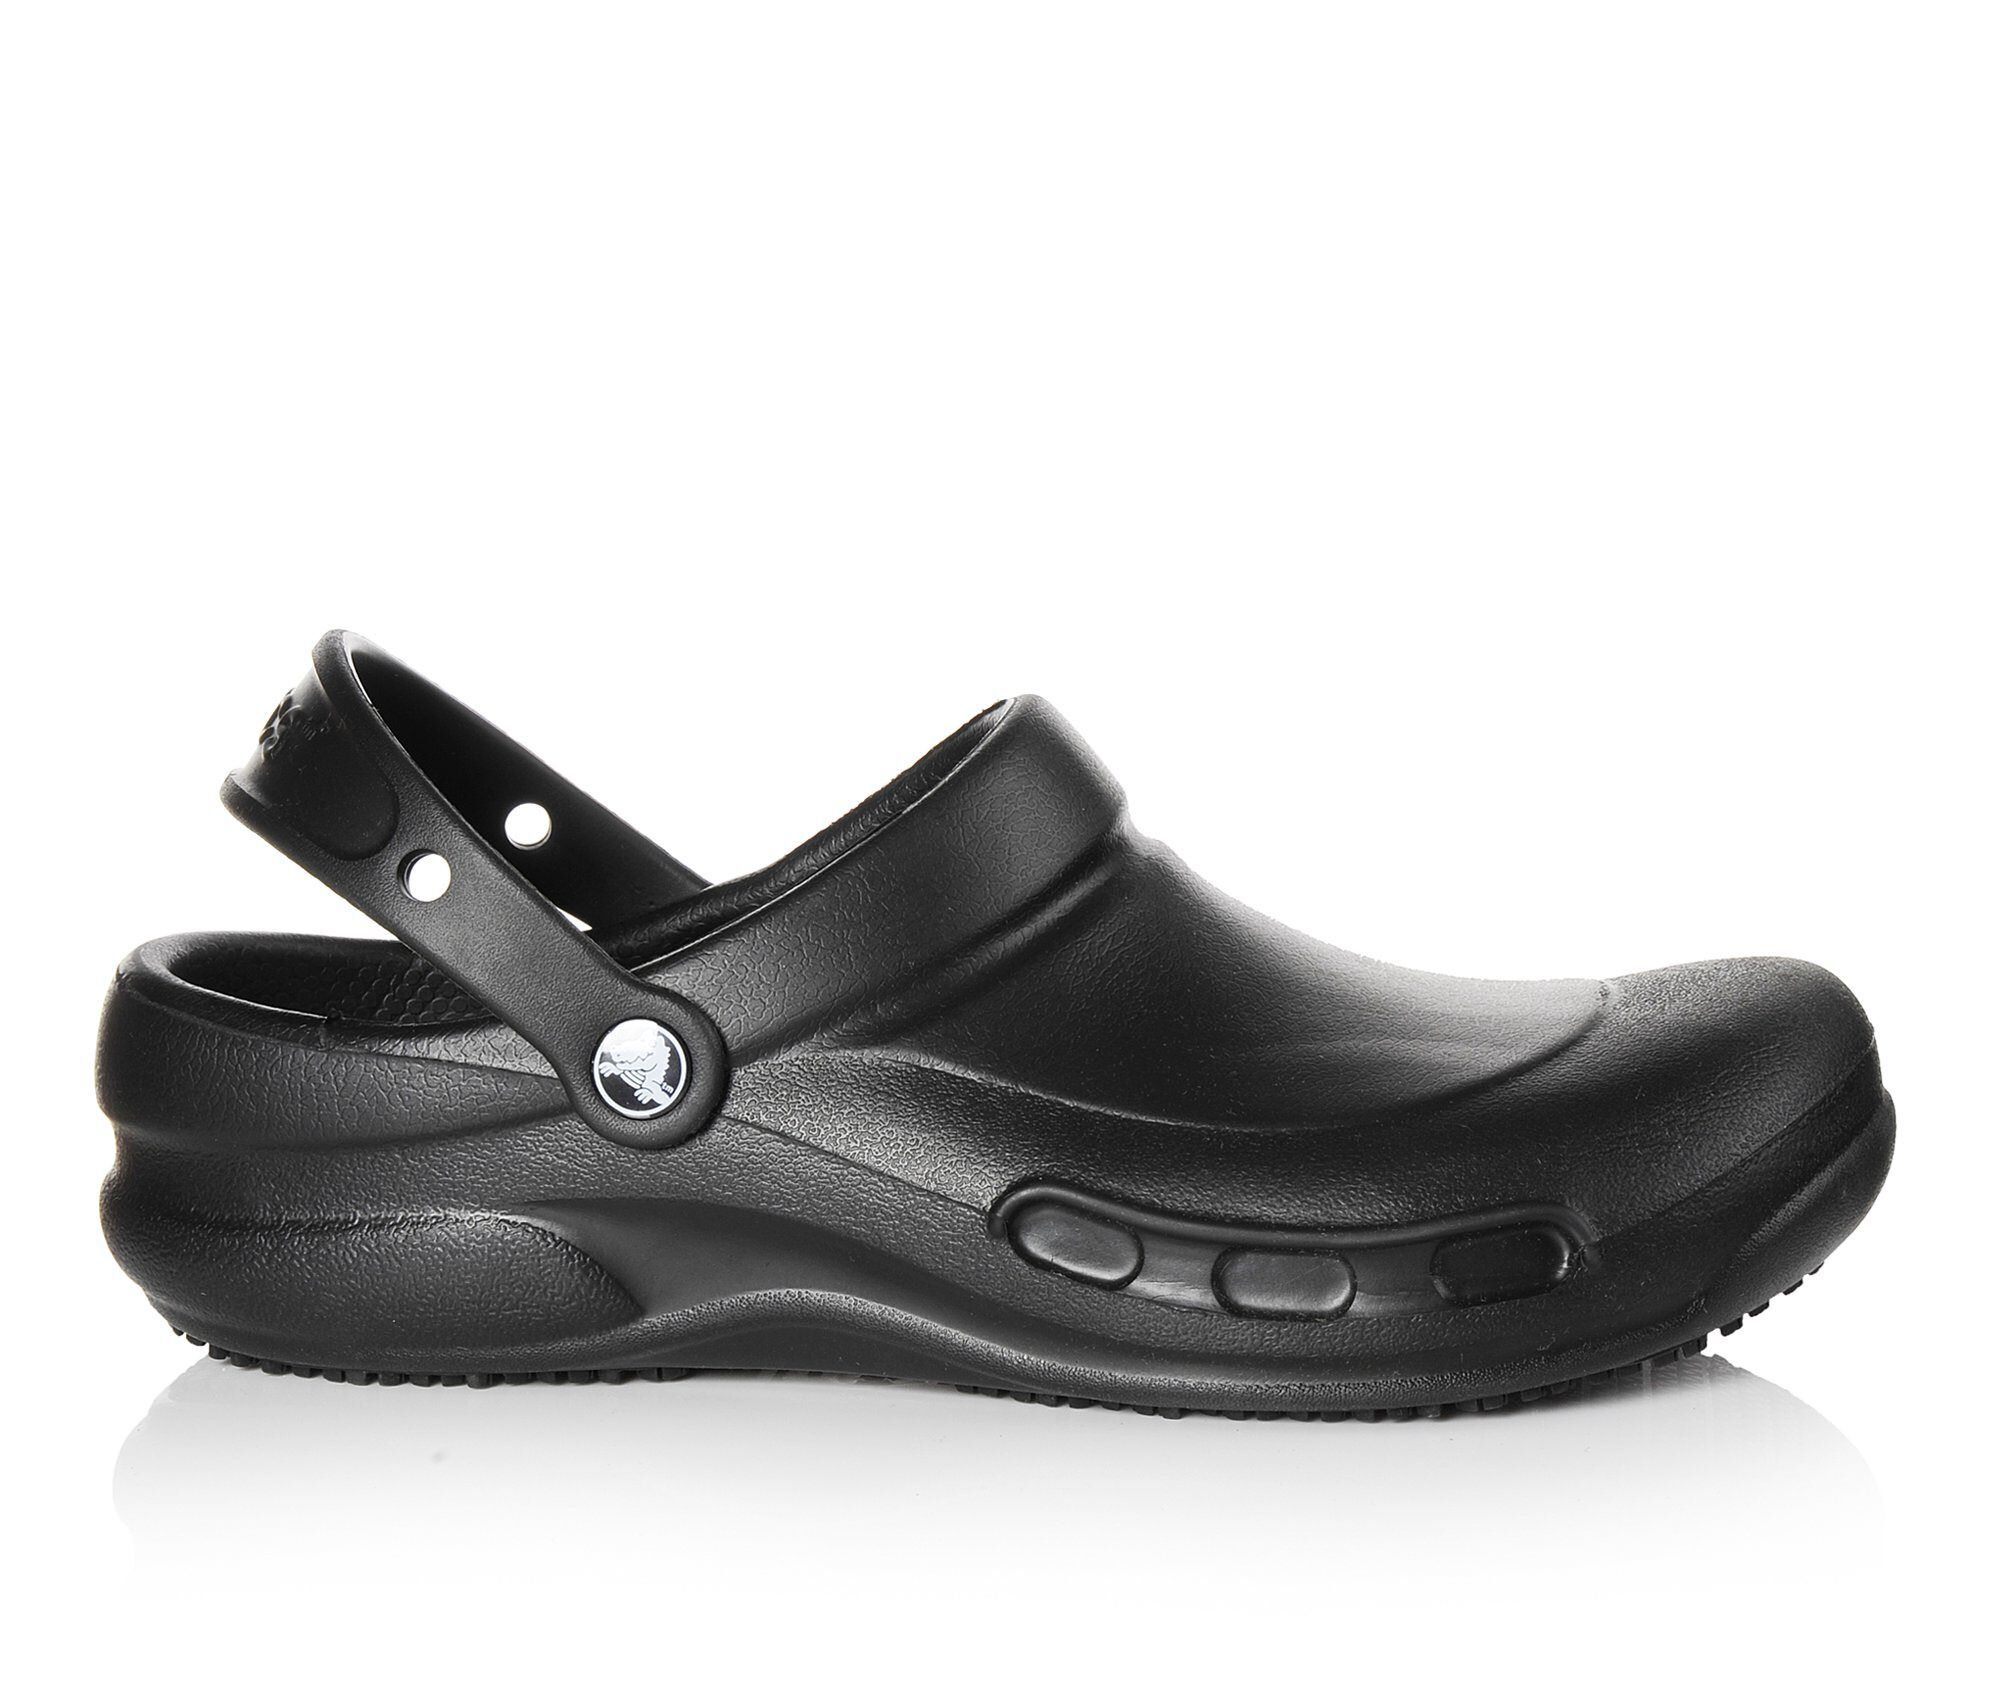 Mens Crocs Bistro Slip Resistant Safety Shoes